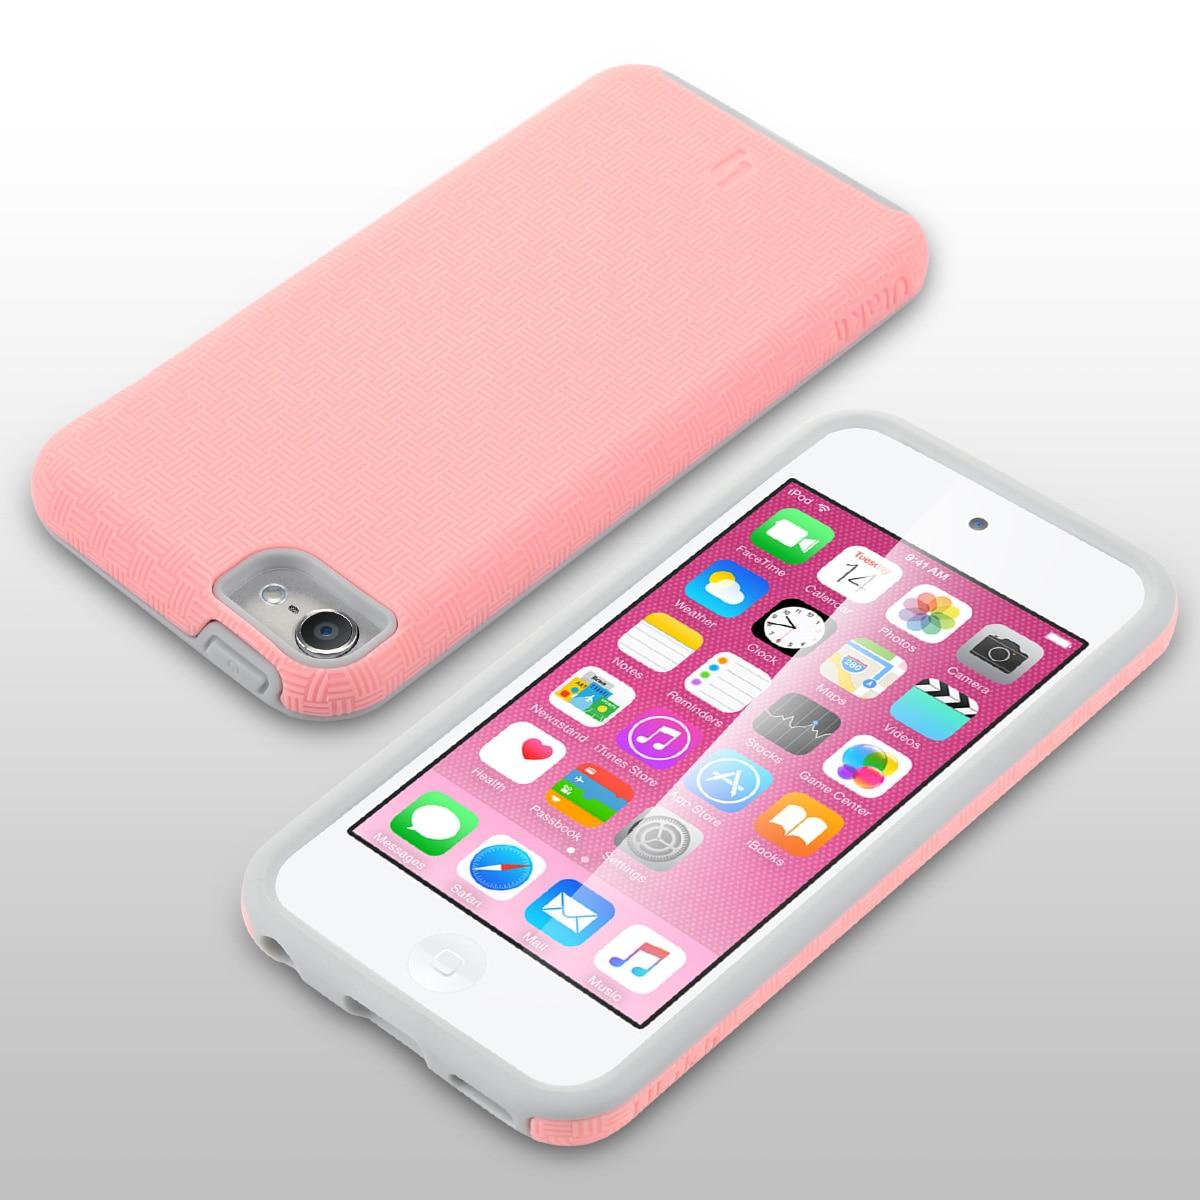 hot sale online fd7ec 9a4e2 US $11.99 |For Apple iPod Touch 6 & iPod Touch 5 Case, ULAK [SLICK ARMOR]  Slim Protection Case for Apple iPod Touch 6 5th Generation on  Aliexpress.com ...